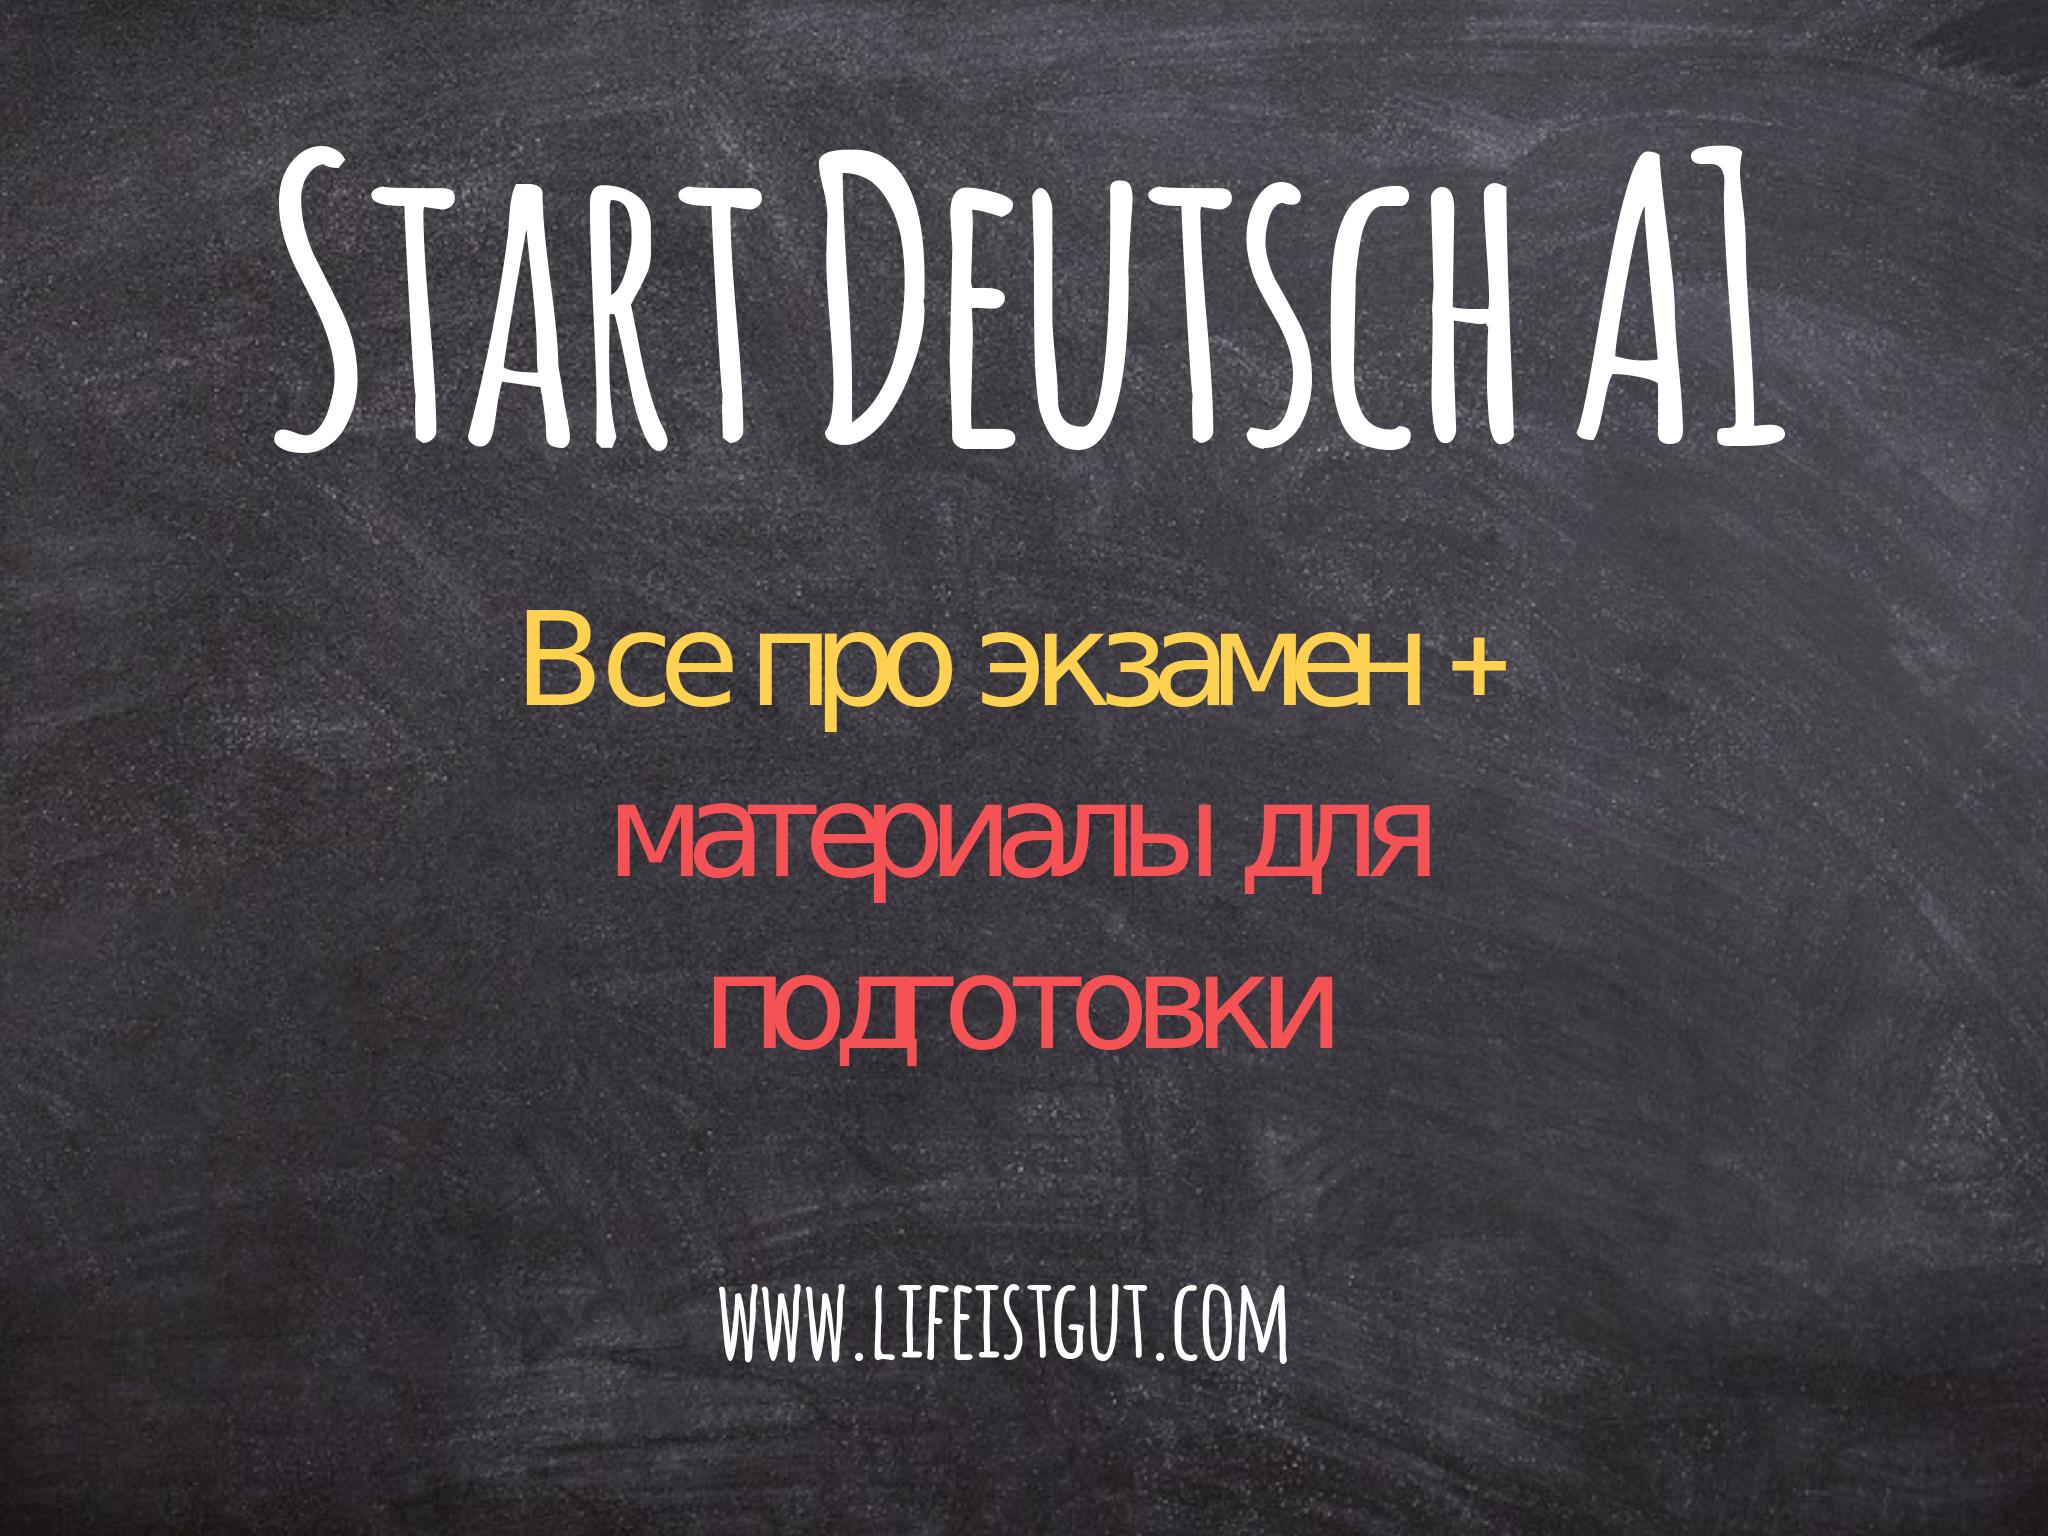 Start Deutsch A1 экзамен и материалы для подготовки!